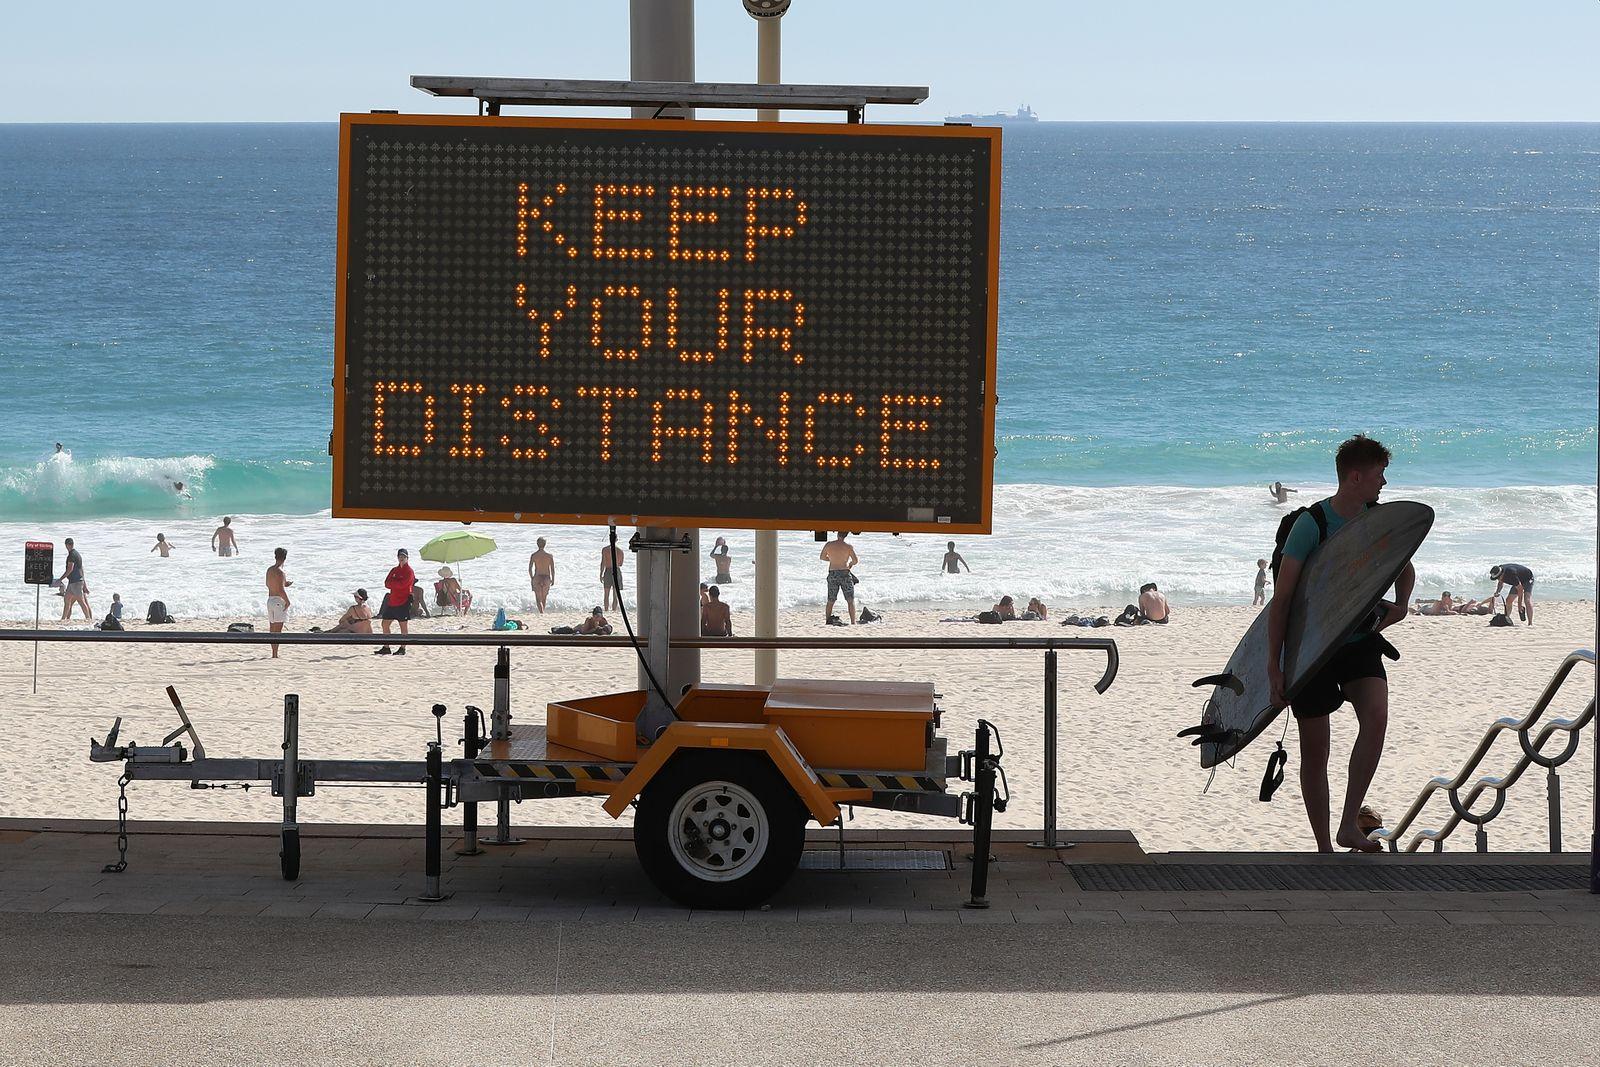 Australians Mark Easter Long Weekend In Coronavirus Lockdown